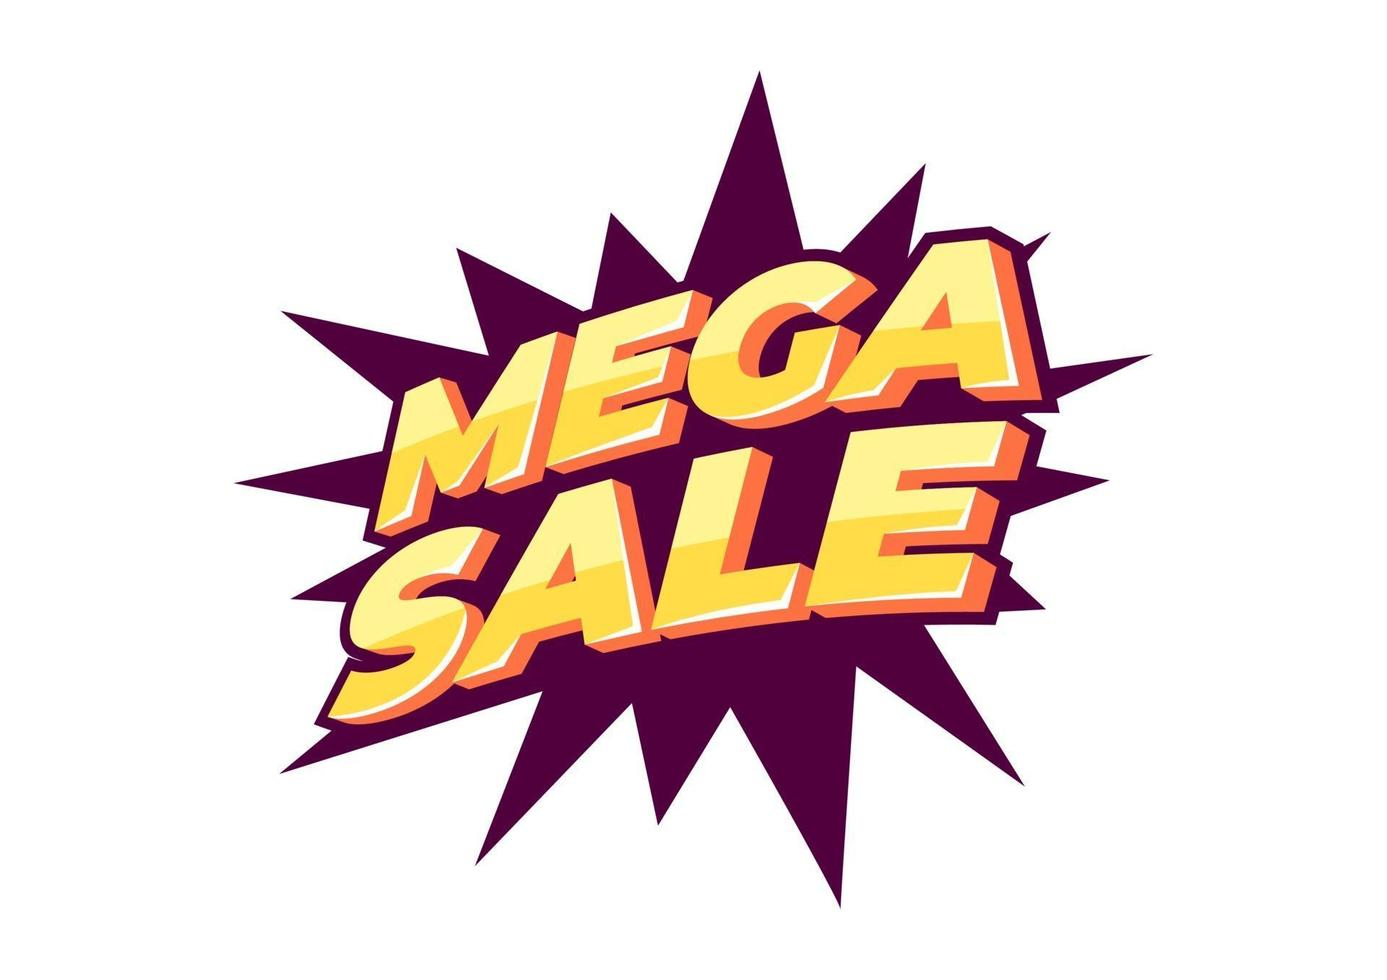 Mega Sale Banner Template Design, Grote Verkoop Speciale Aanbieding. einde seizoen speciale aanbieding banner. vector